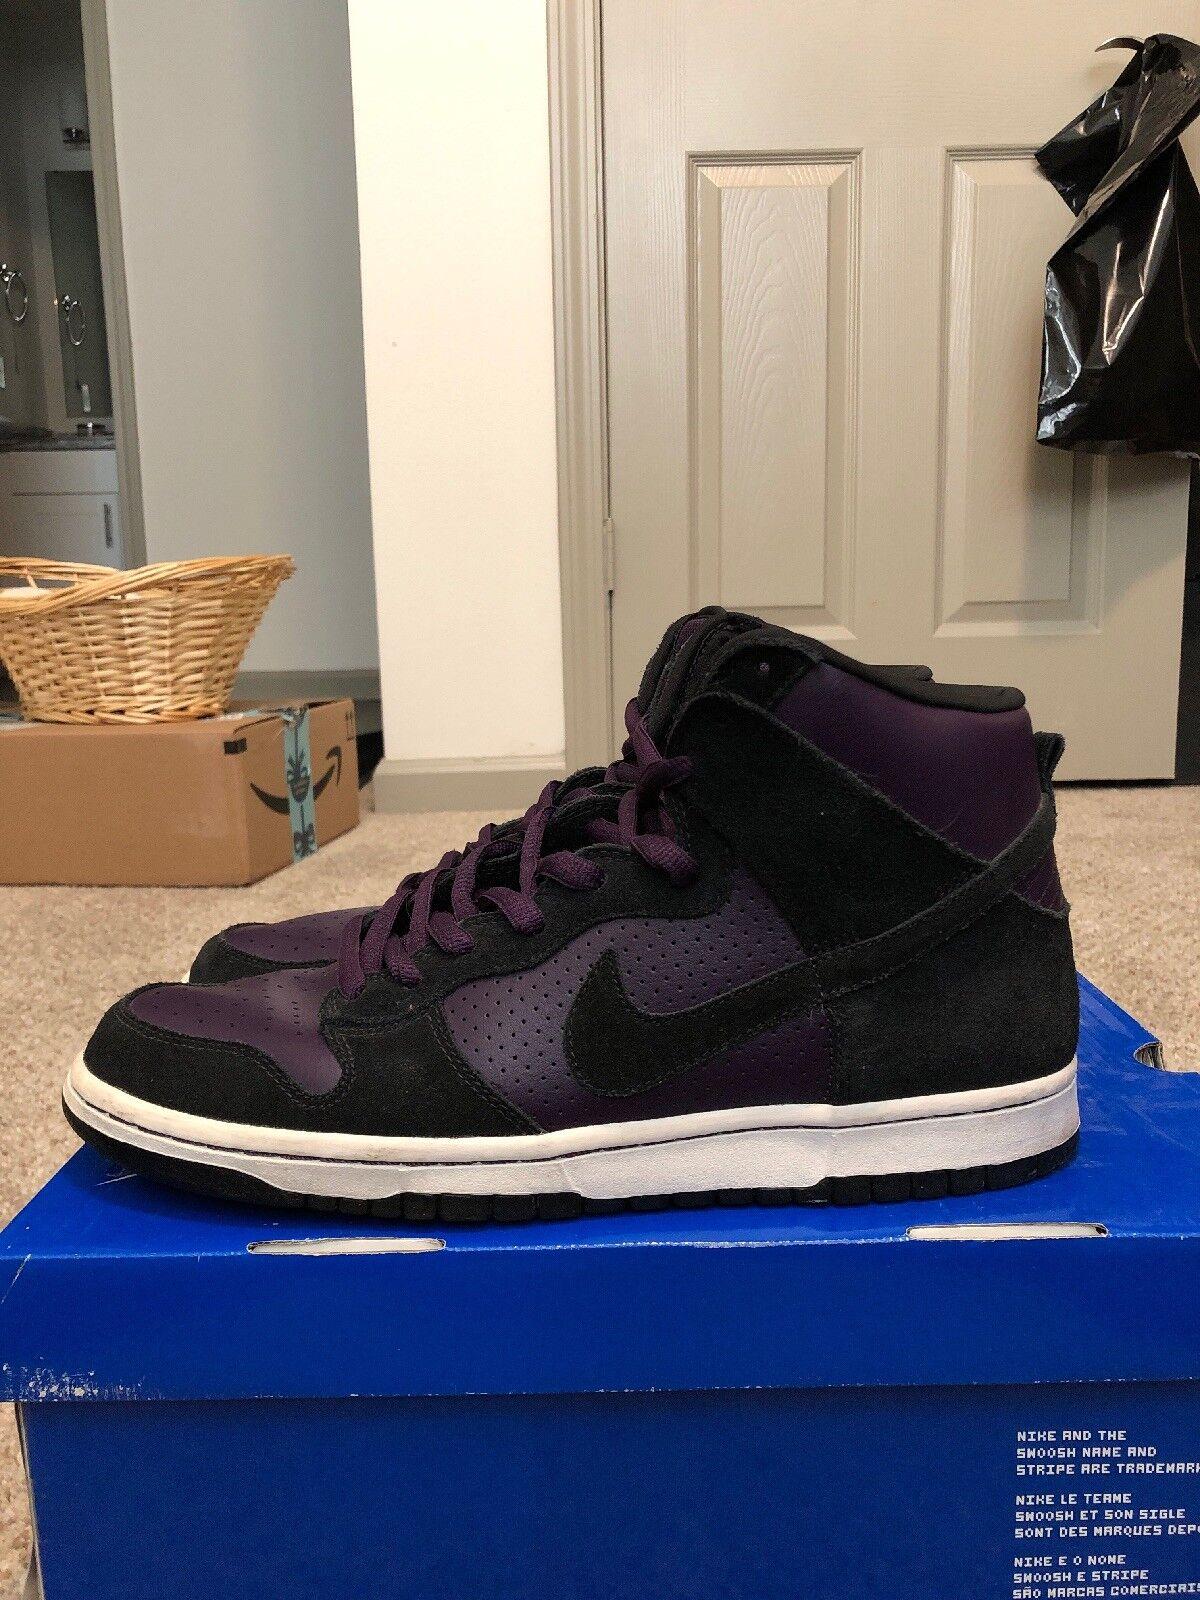 Nike Sb Dunk High Grand Purple 305050 500 Size 10.5